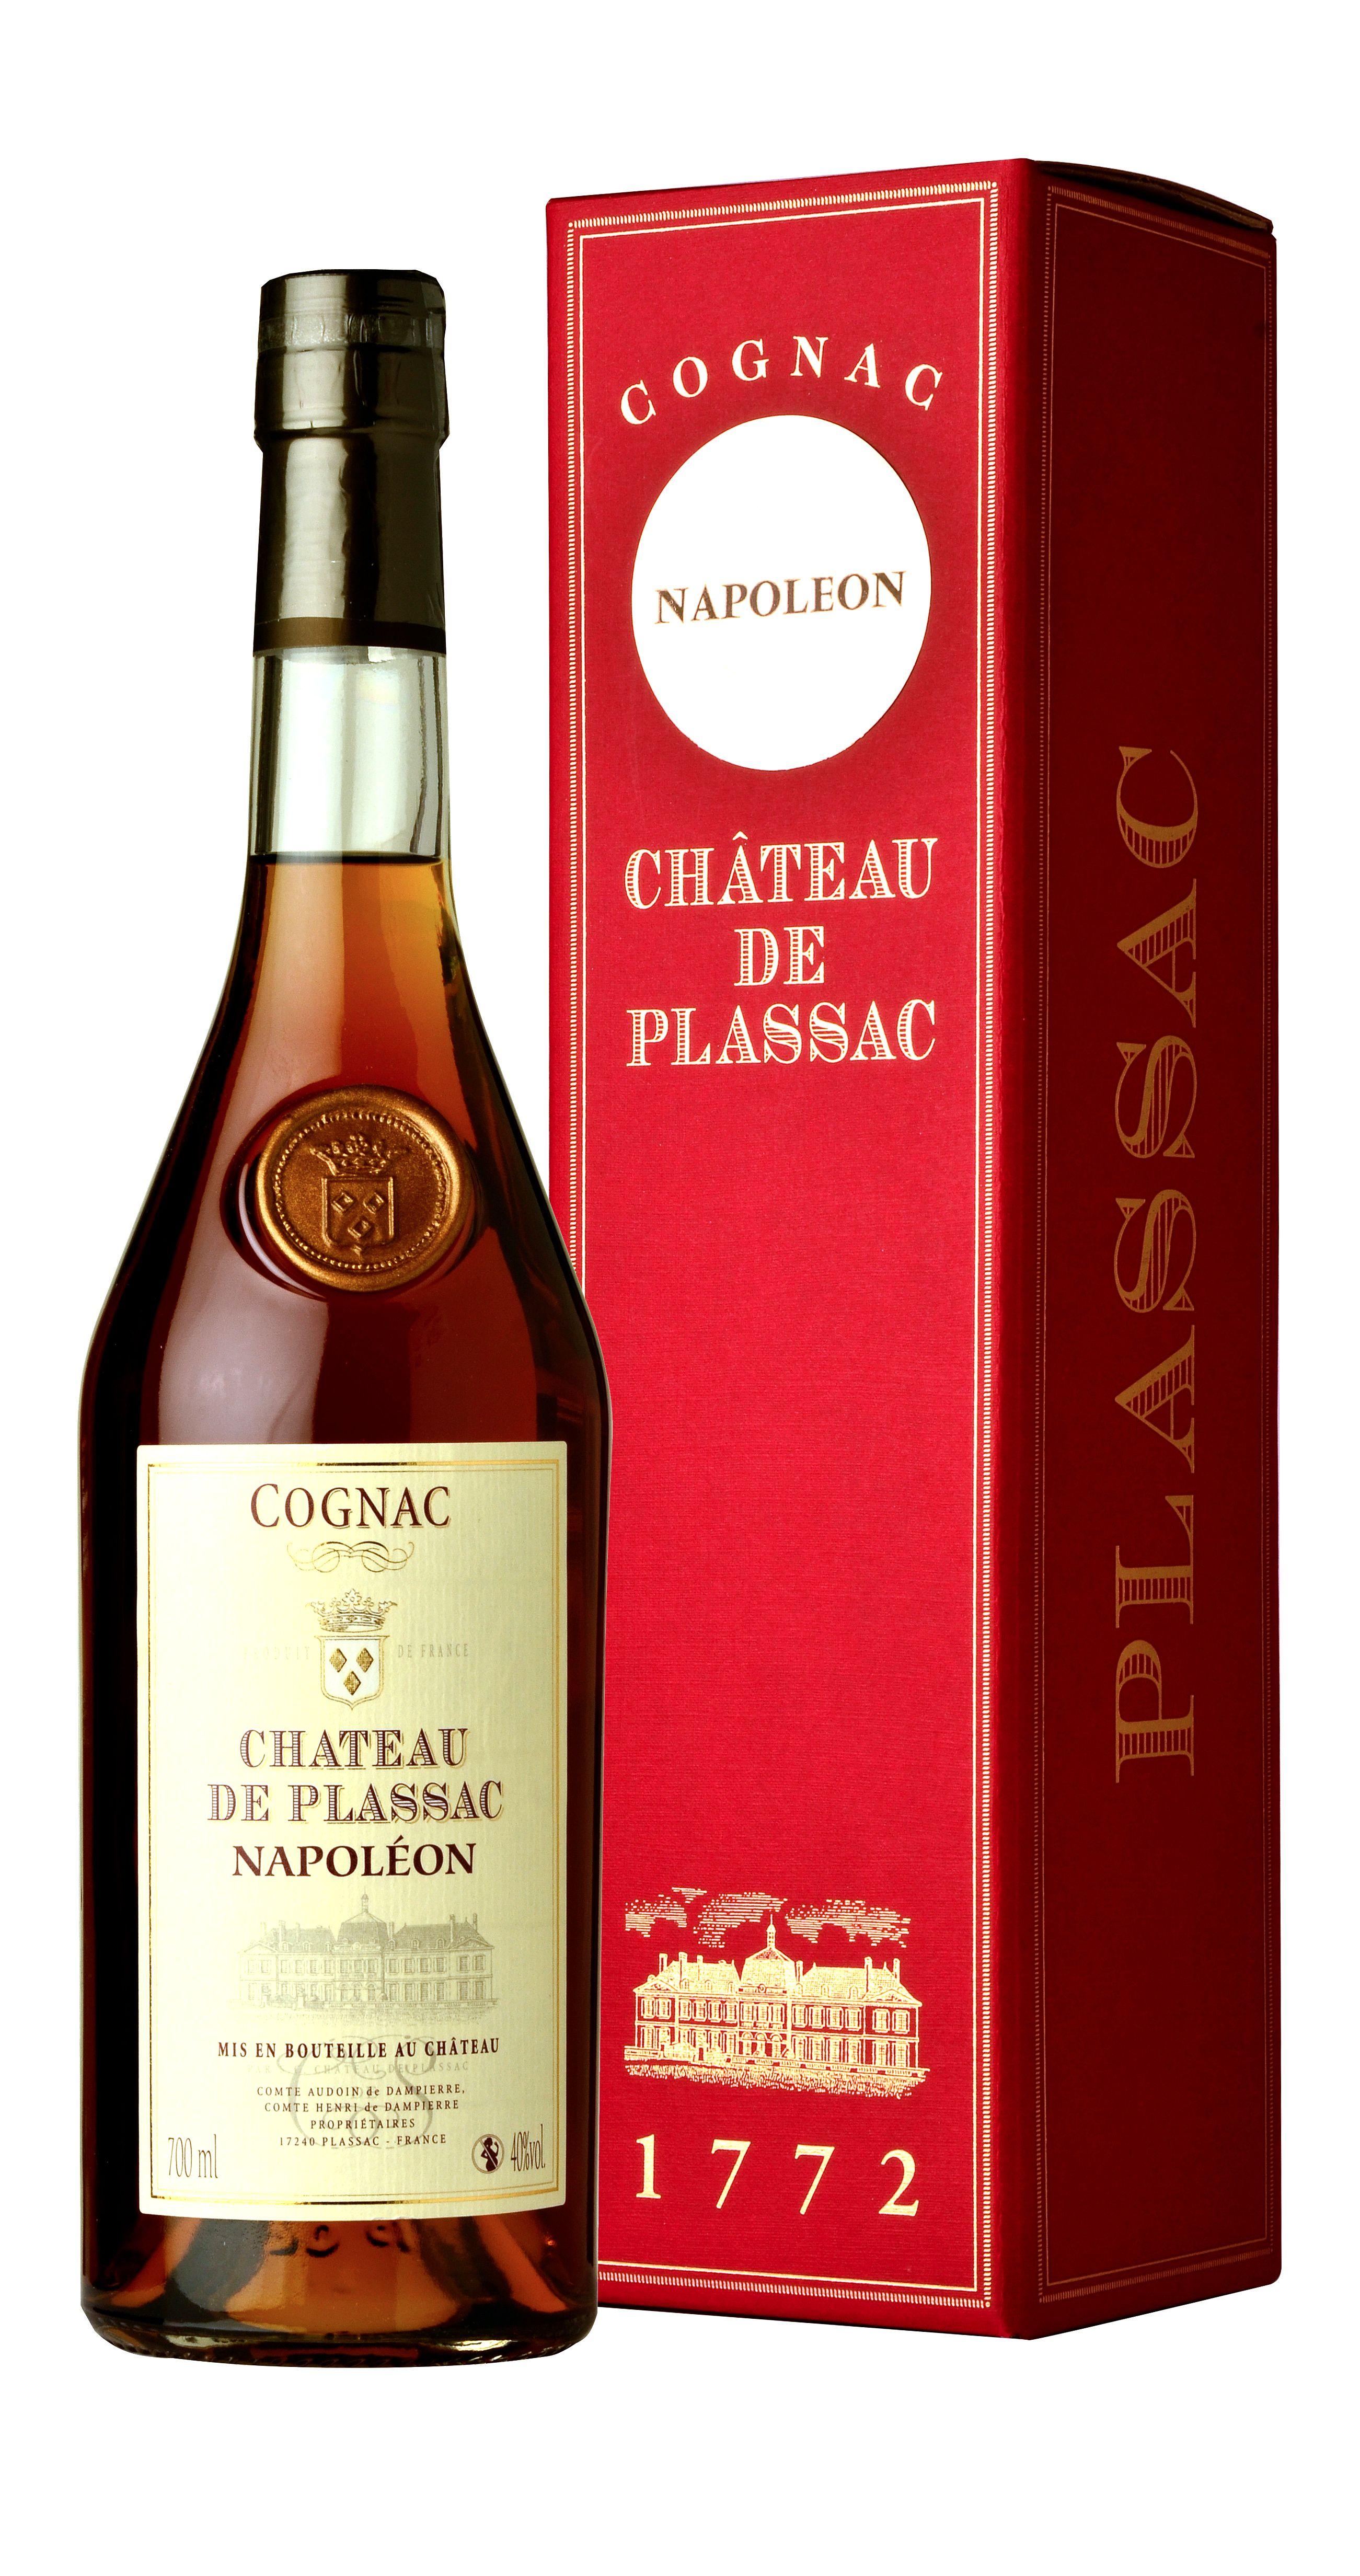 Château de Plassac Cognac Napoleon